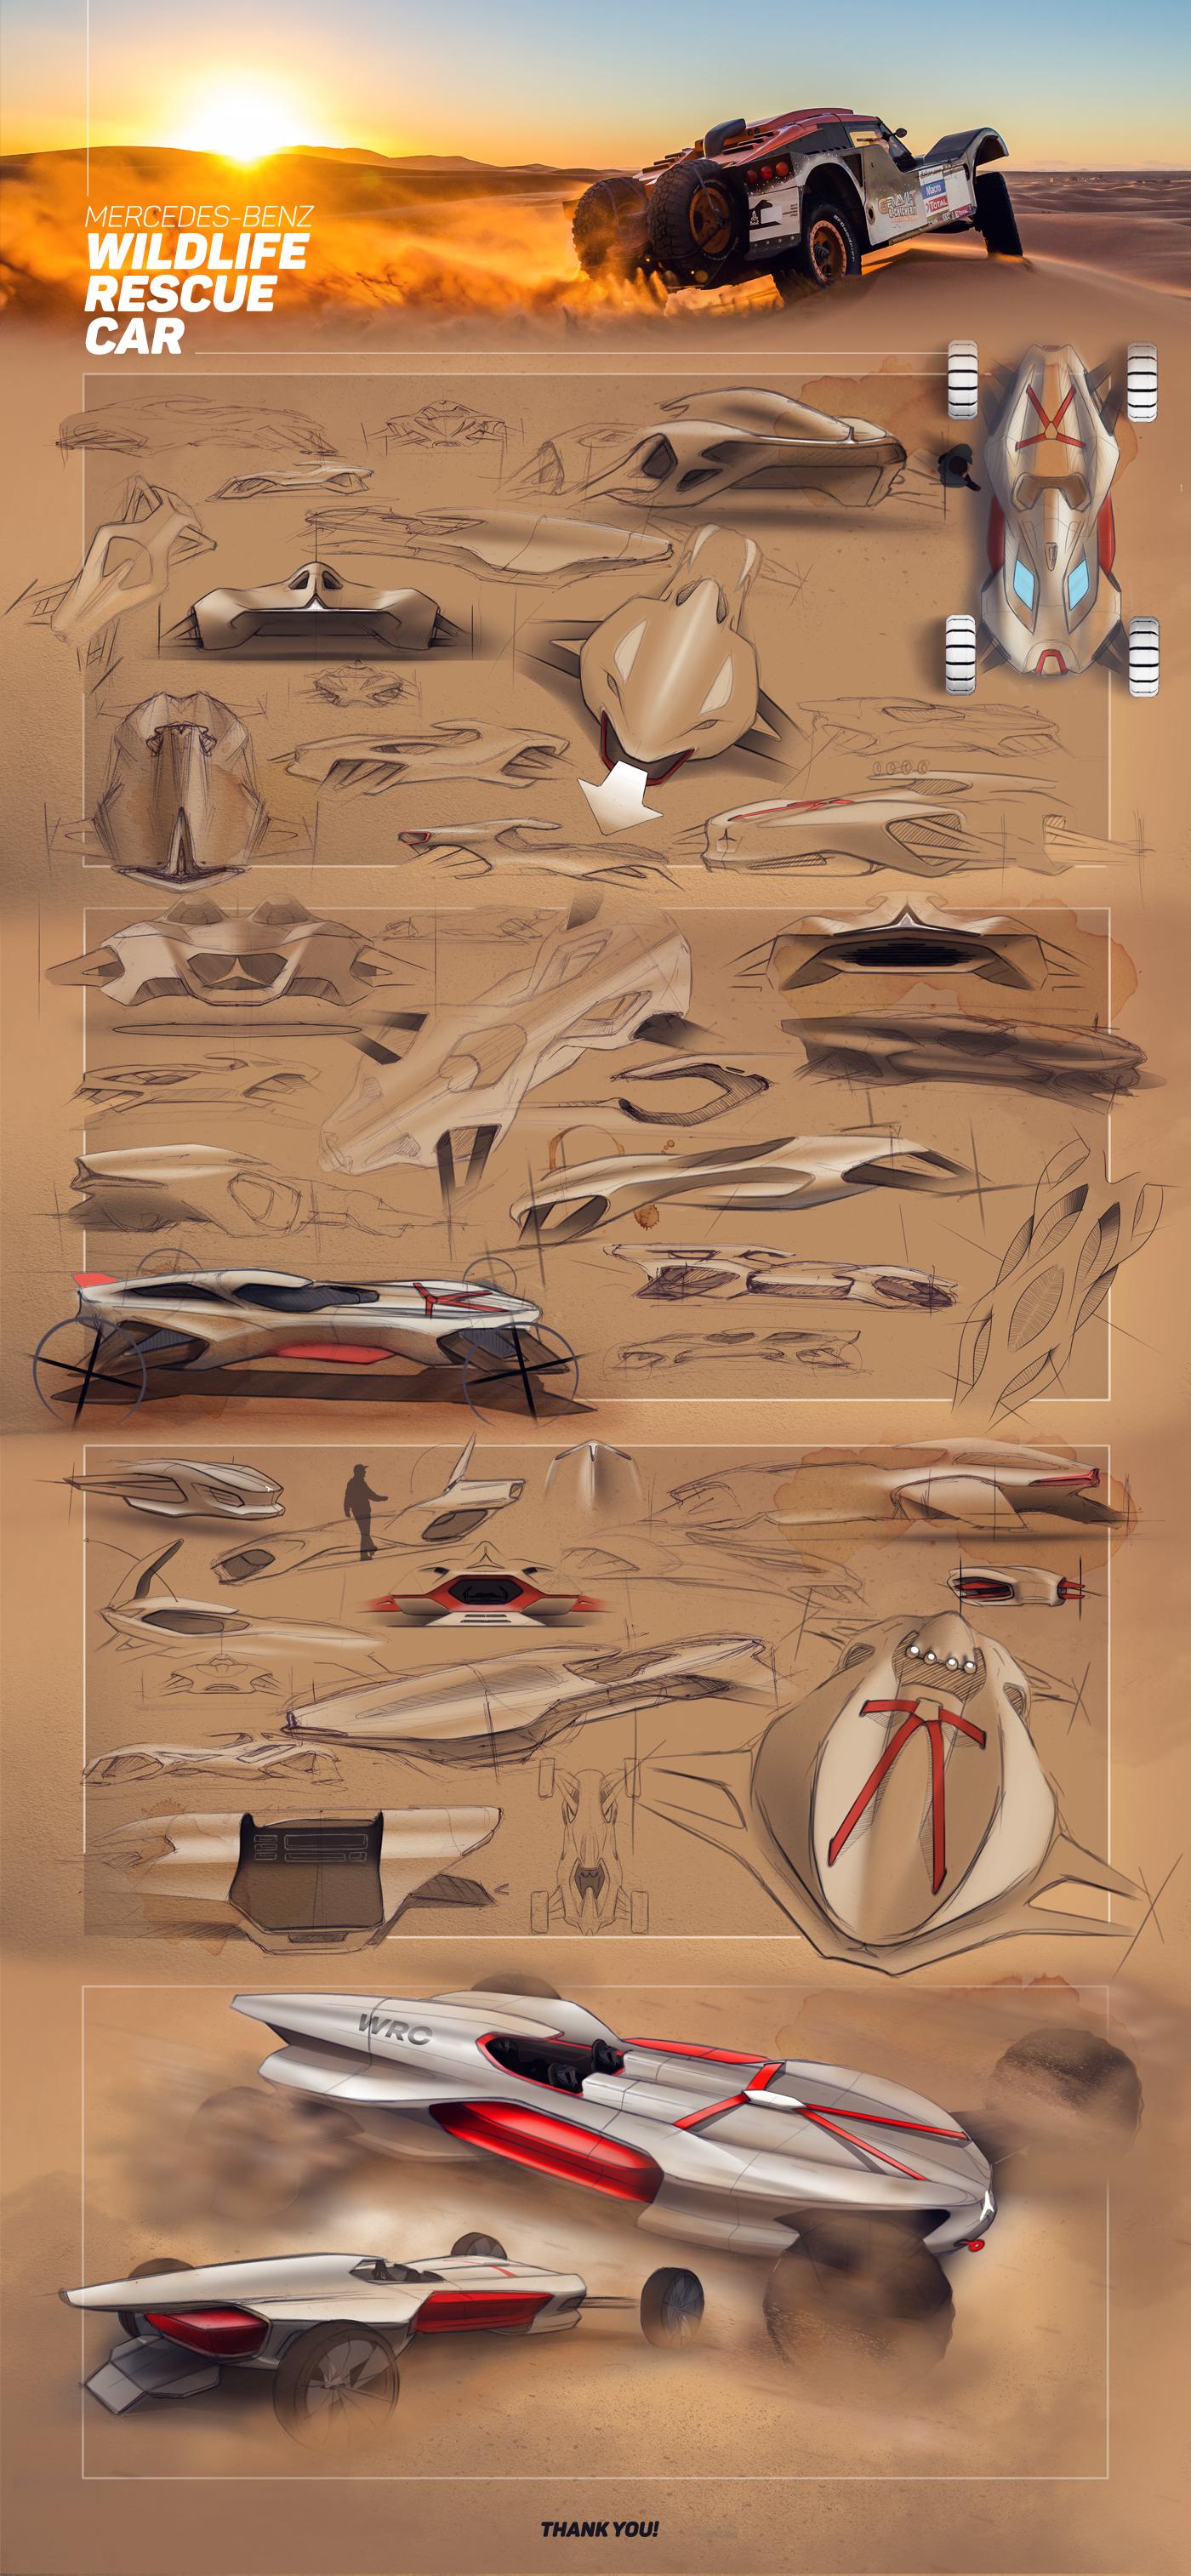 Rescue Car Transportation Design mercedes wildlife desert emergency